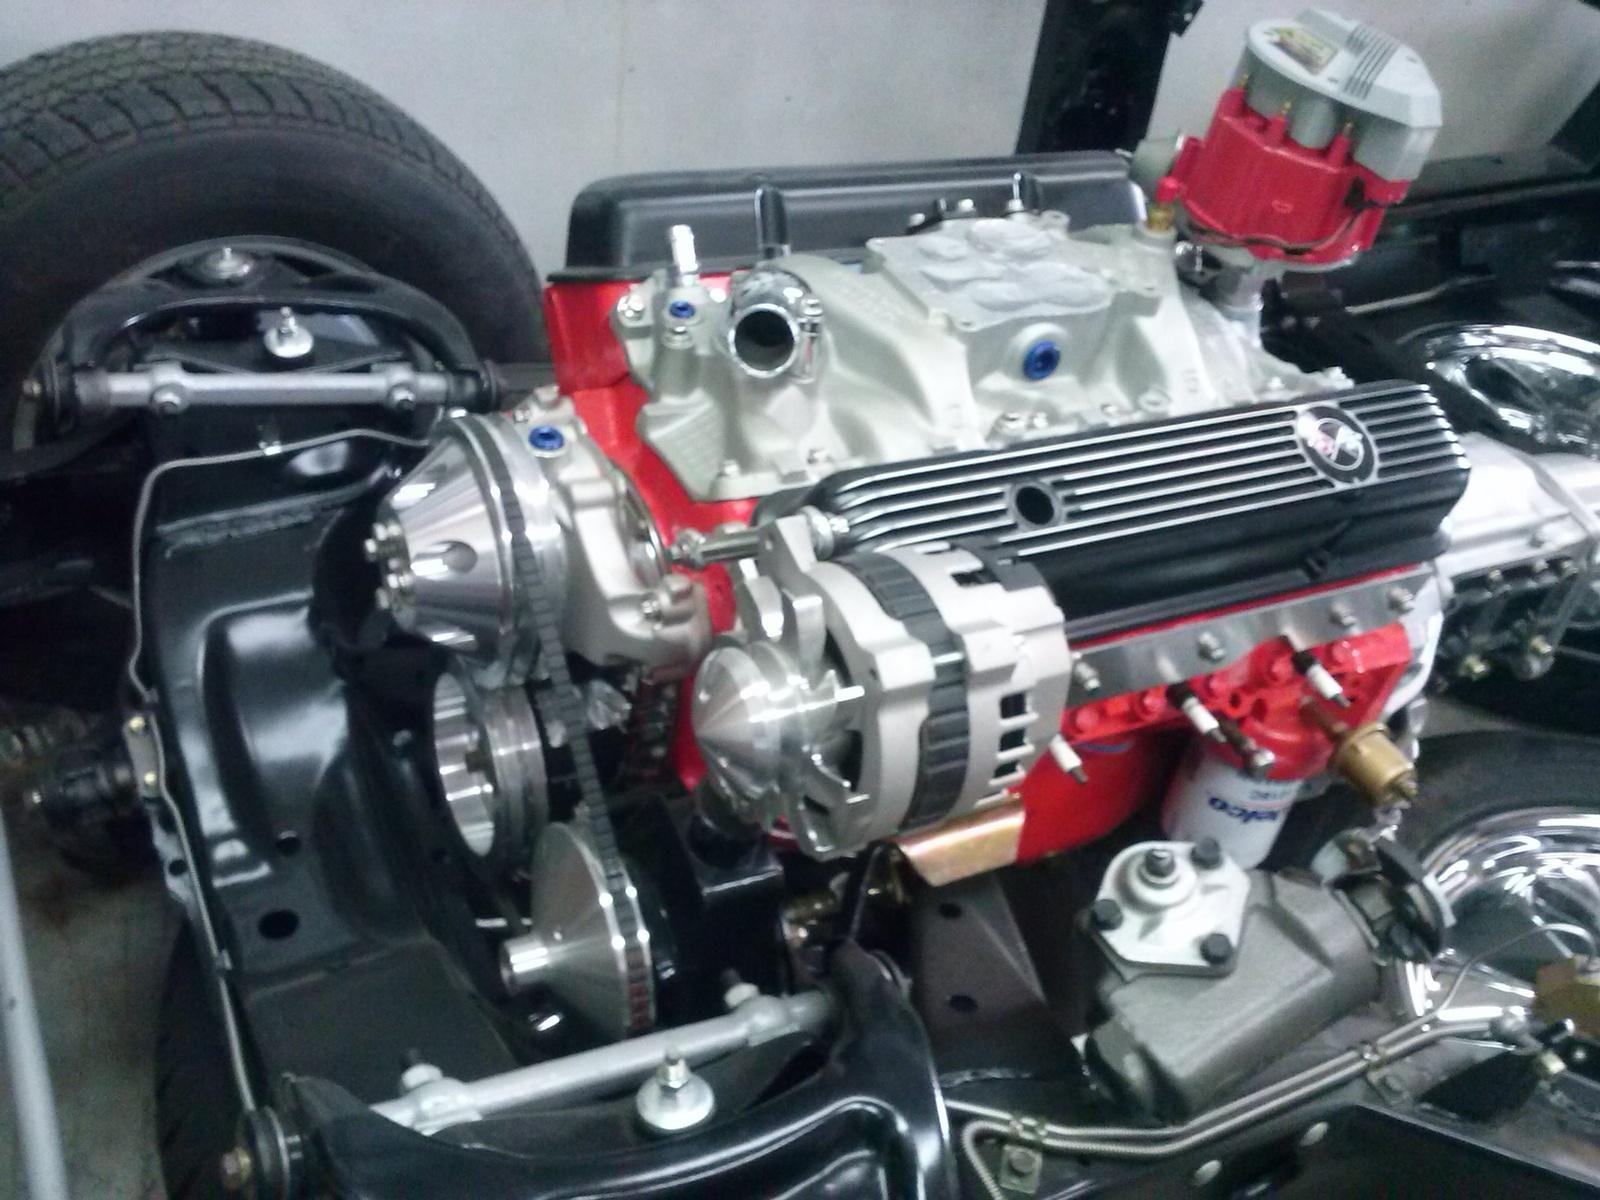 Chevrolet Corvette Questions - My dad had a 1975 Corvette Stingray ...